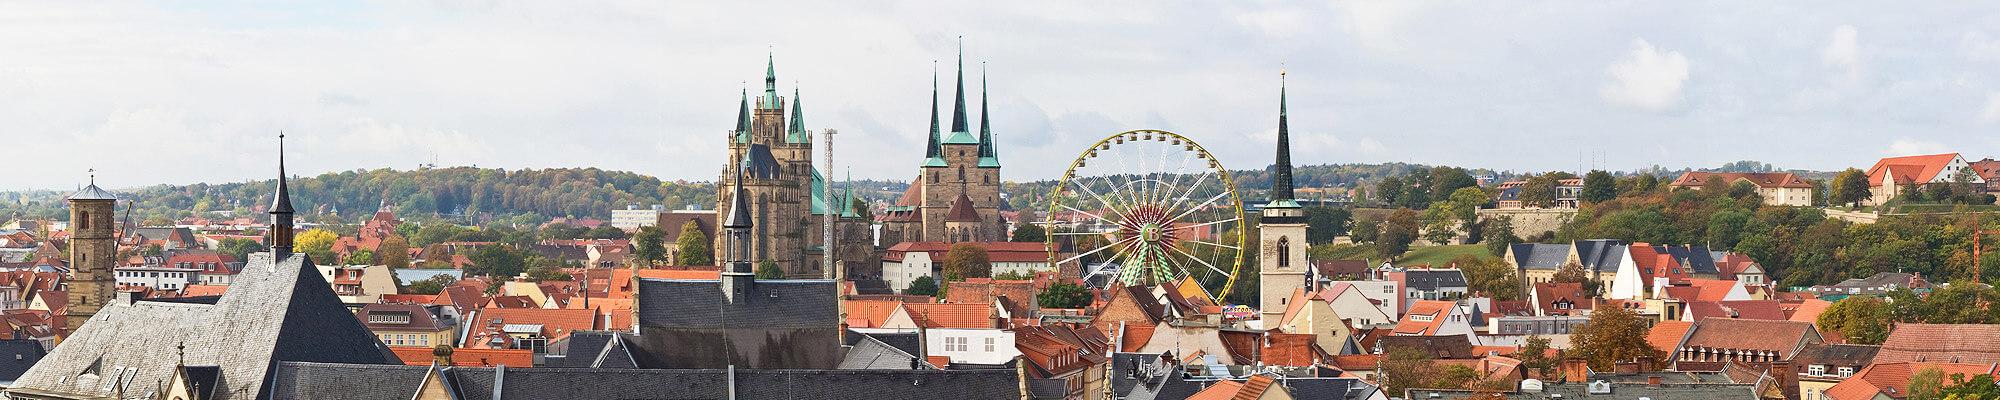 Erfurt-01